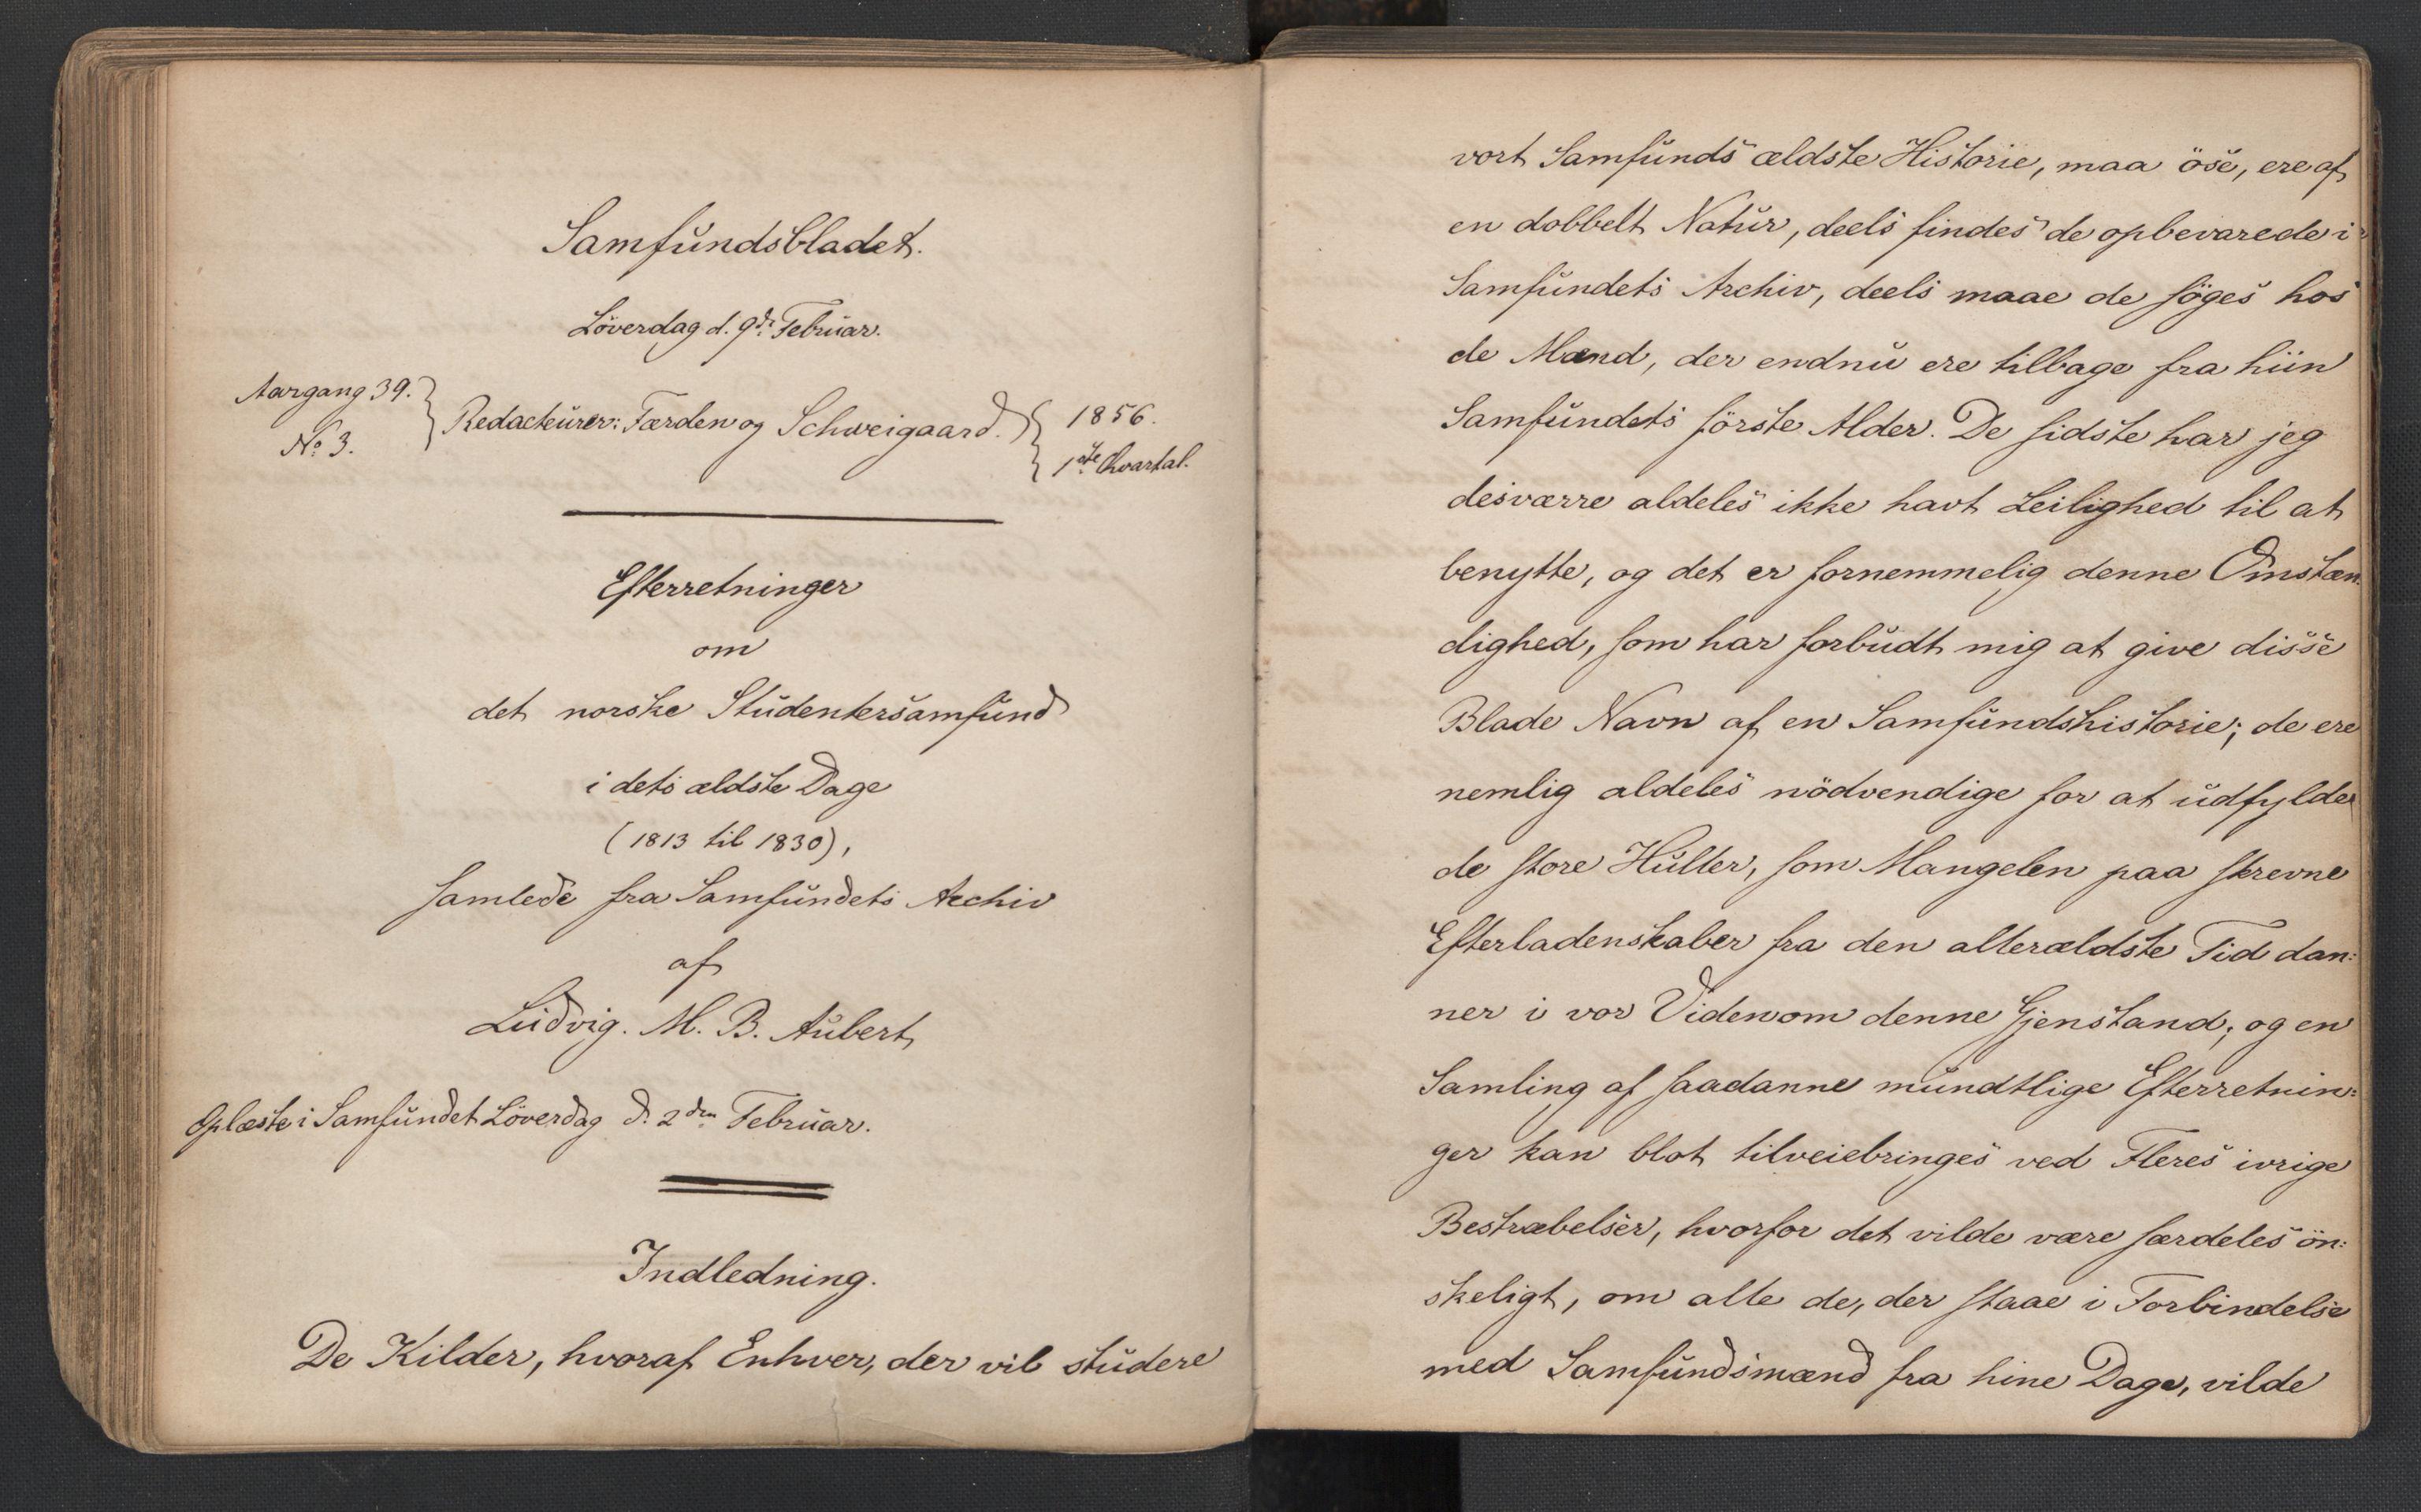 RA, Det Norske Studentersamfund, X/Xa/L0005, 1855-1856, s. 100